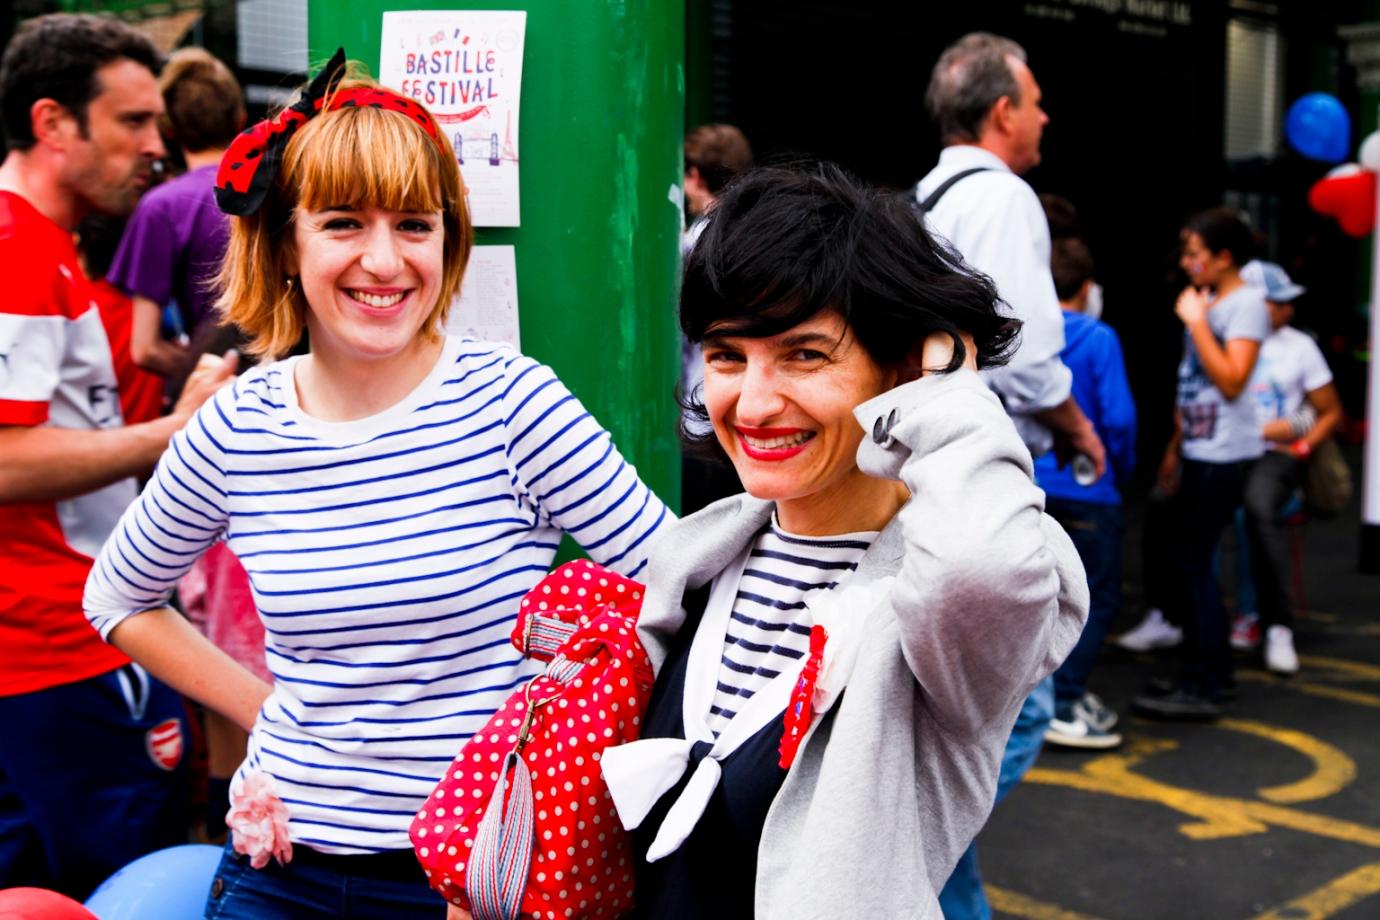 Bastille Day London - Bastille Festival at the Borough Market